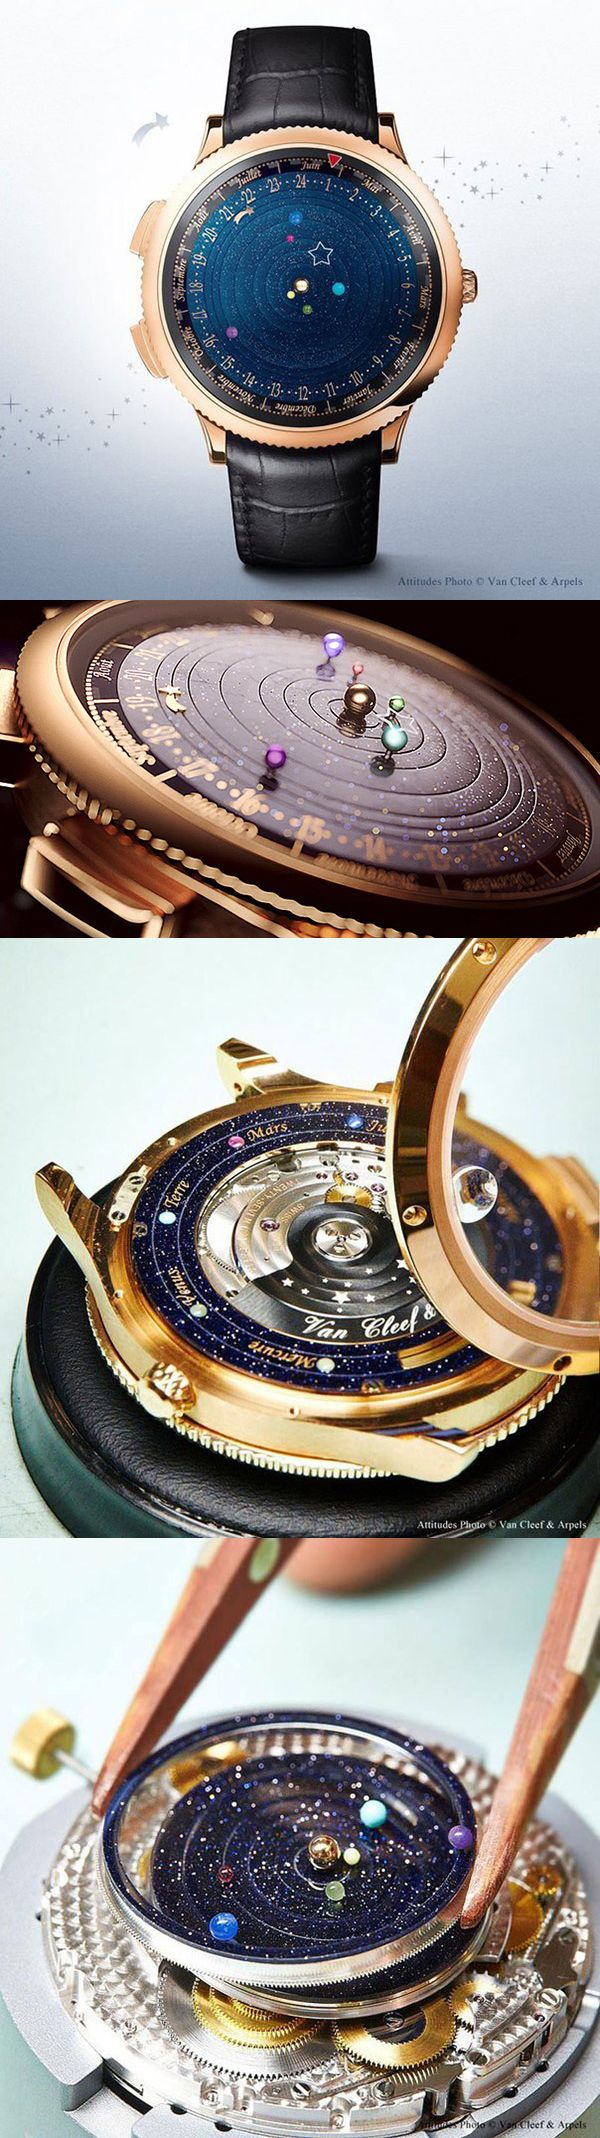 Midnight Planétarium|planets / star / Milky Way / the Galaxy / watch